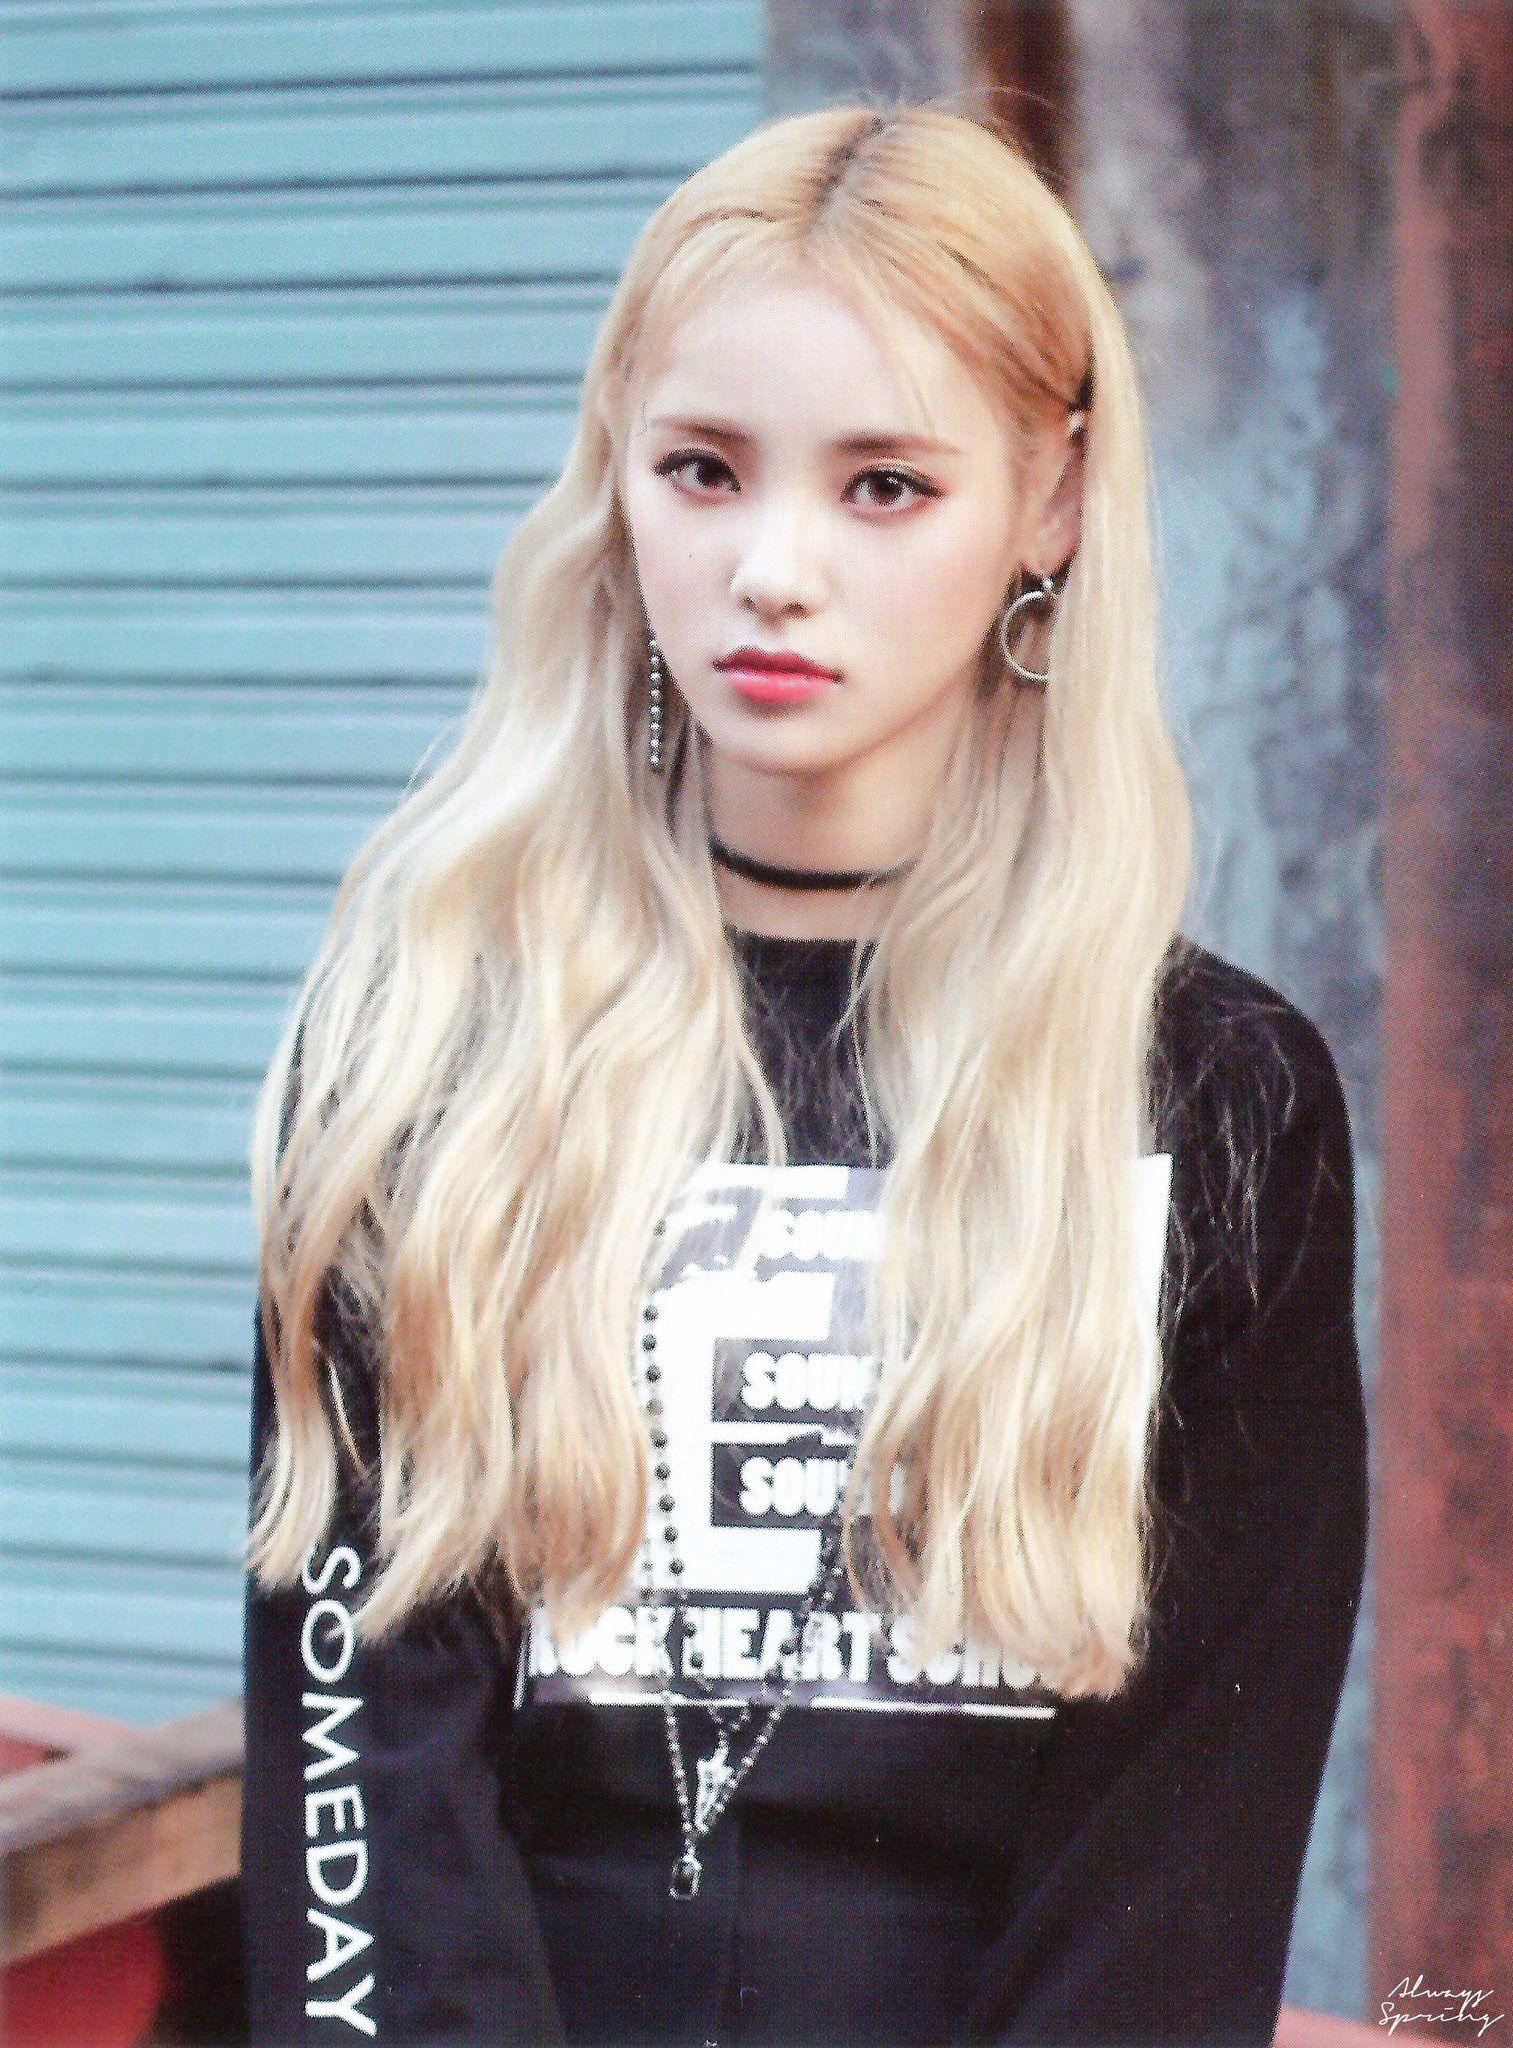 Loona Jinsoul